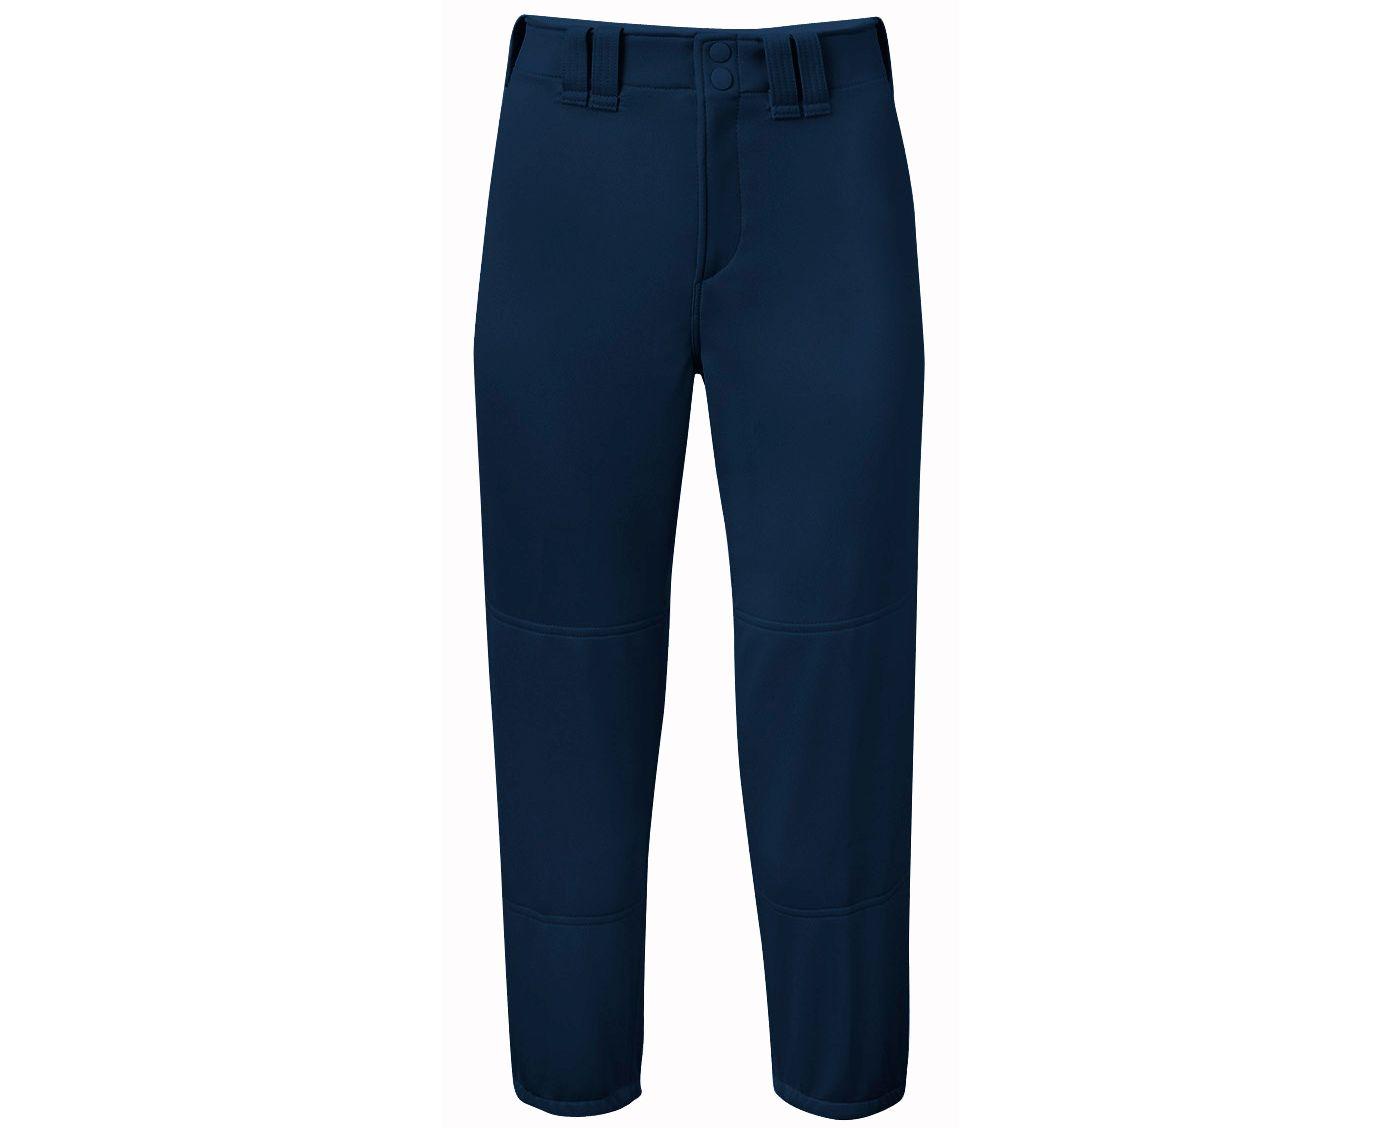 Mizuno Women's Select Low Rise Fastpitch Pants w/ Belt Loops